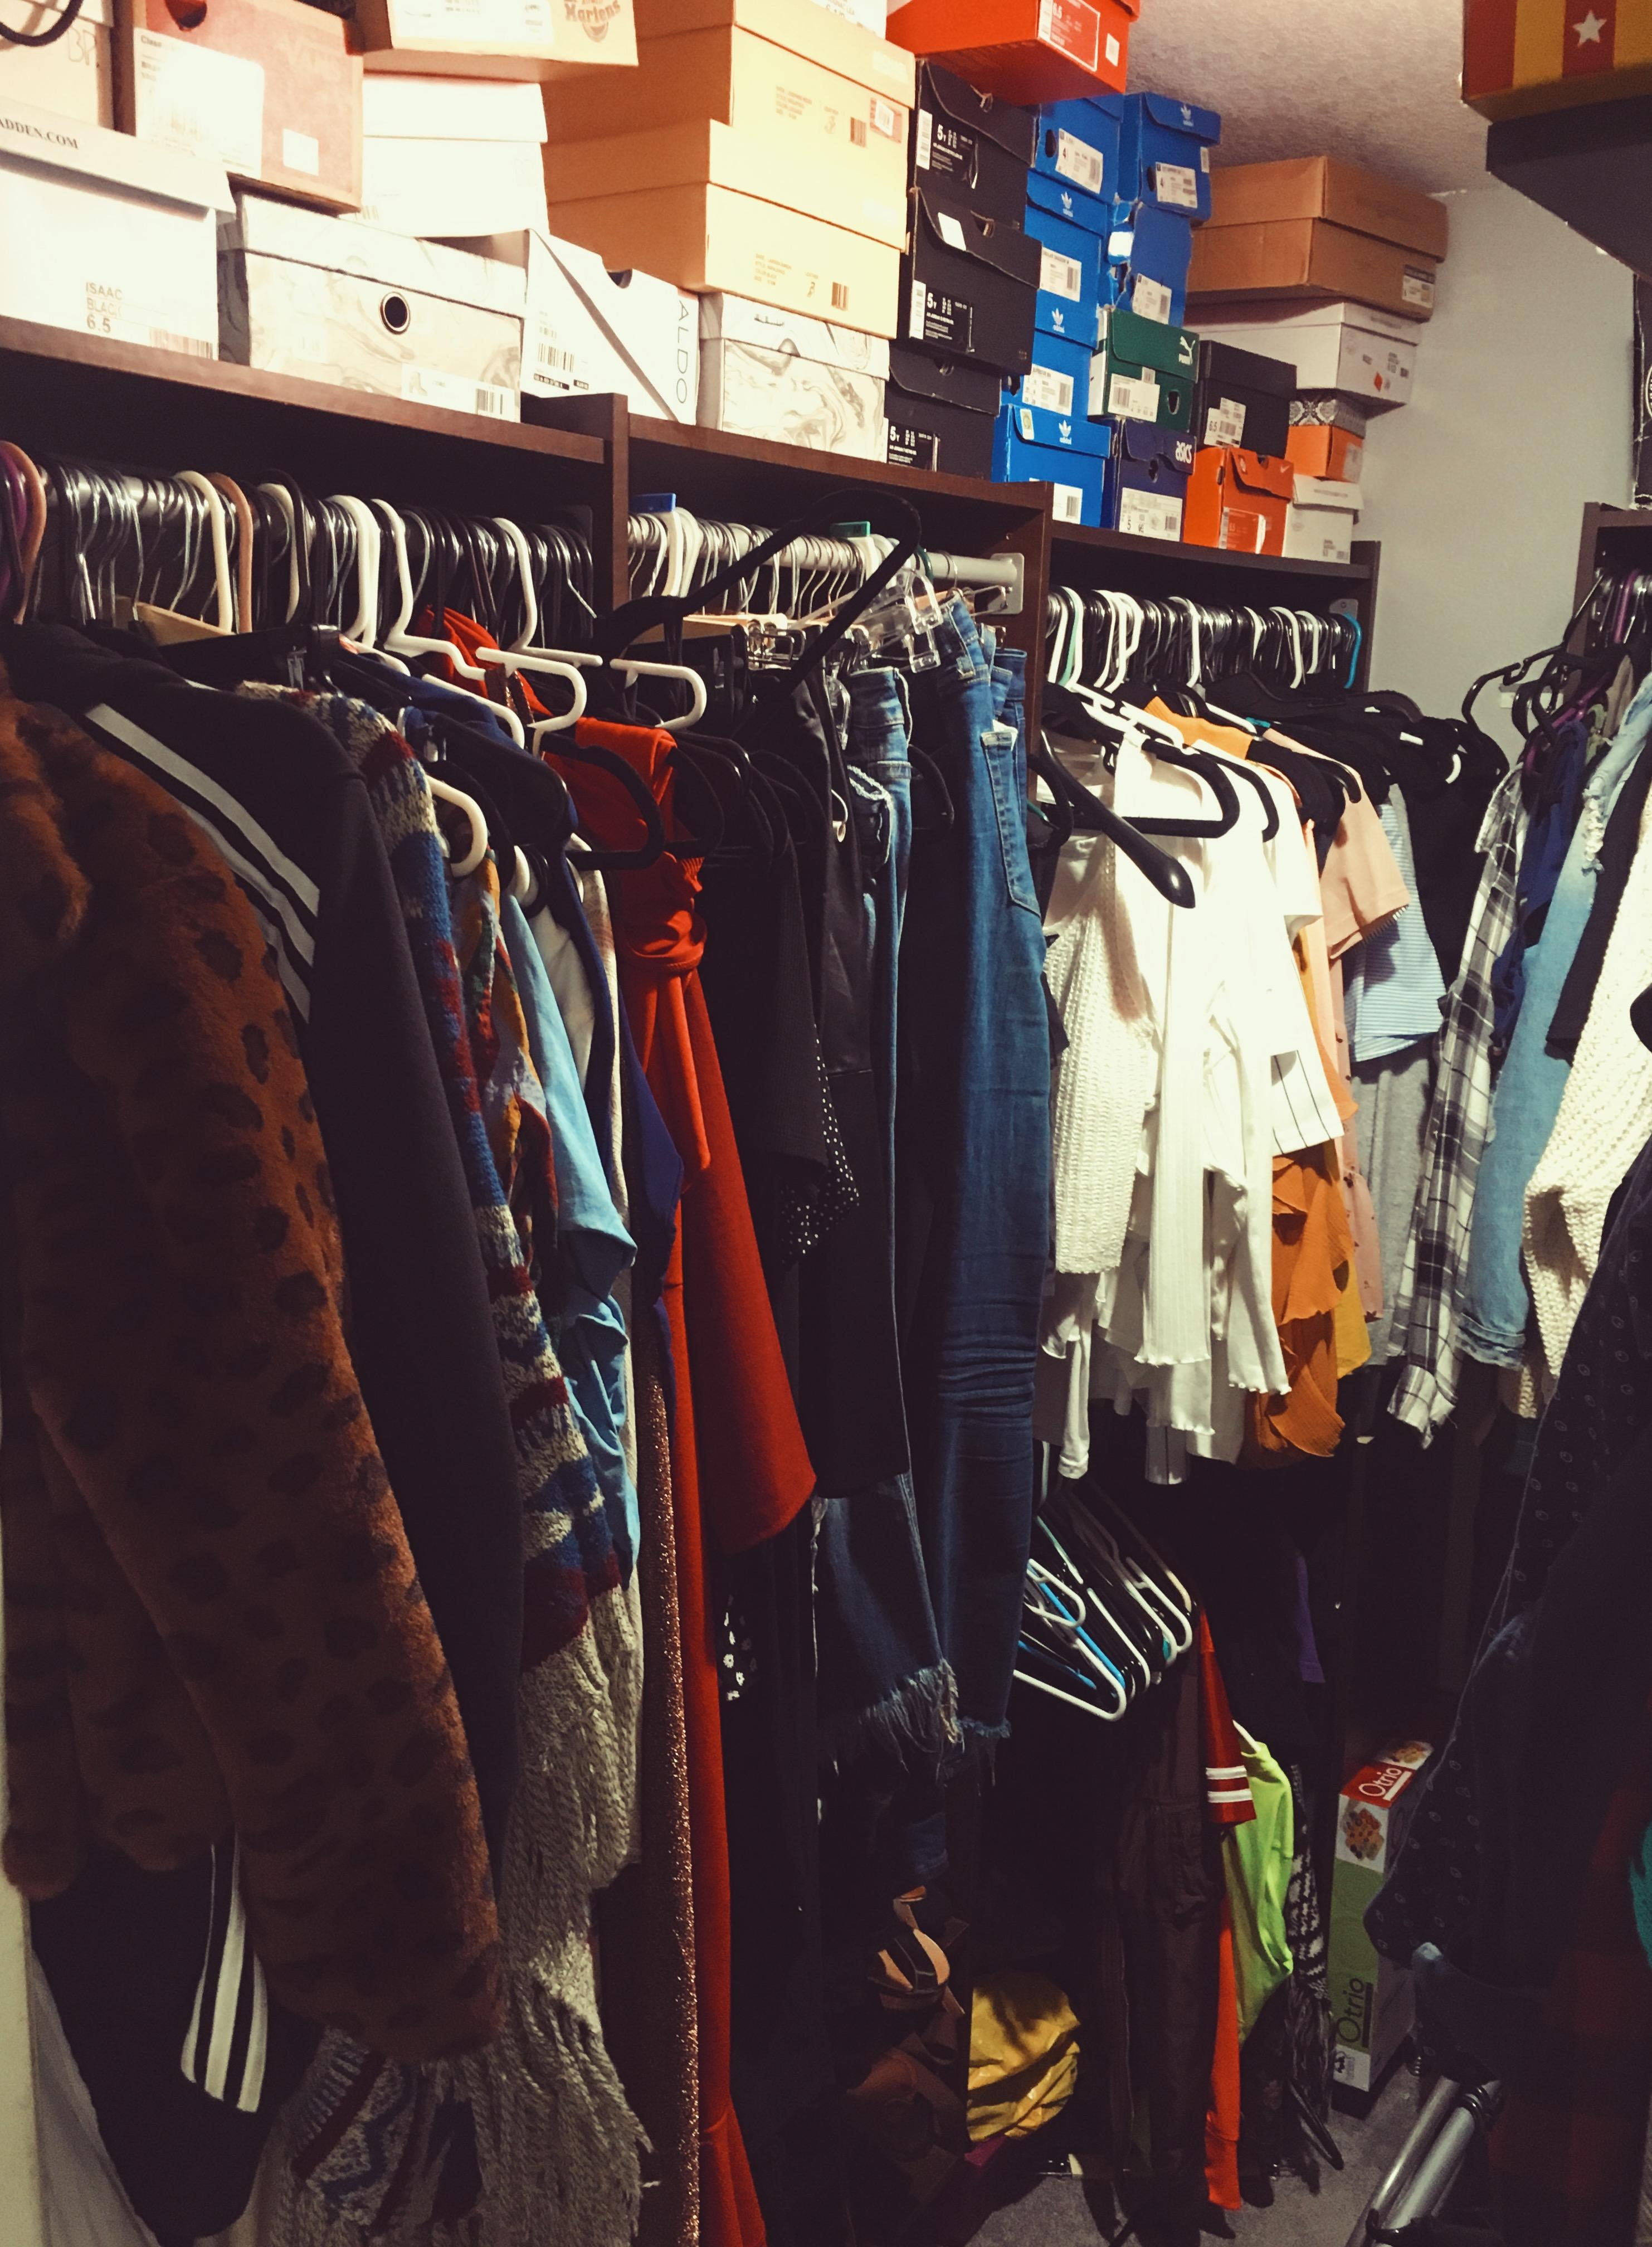 over crowded closet-closet organization-overfilled closet-stuffed disorganized closet-wear who you are